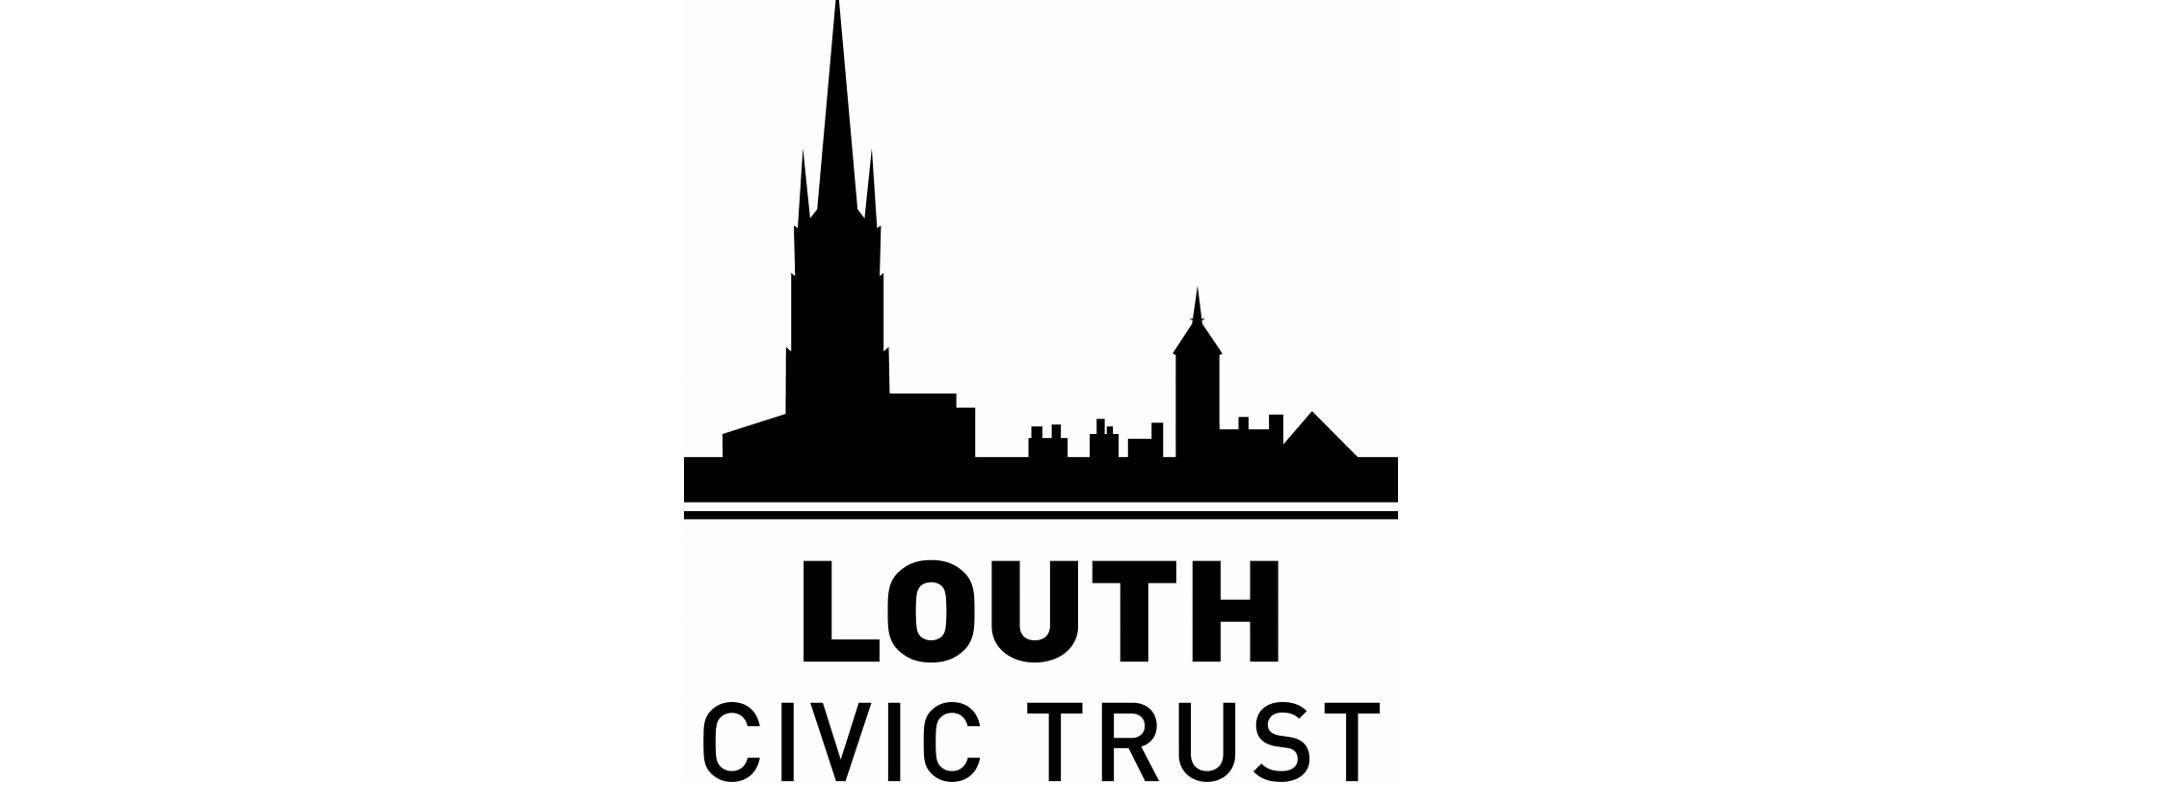 Louth Civic Trust logo